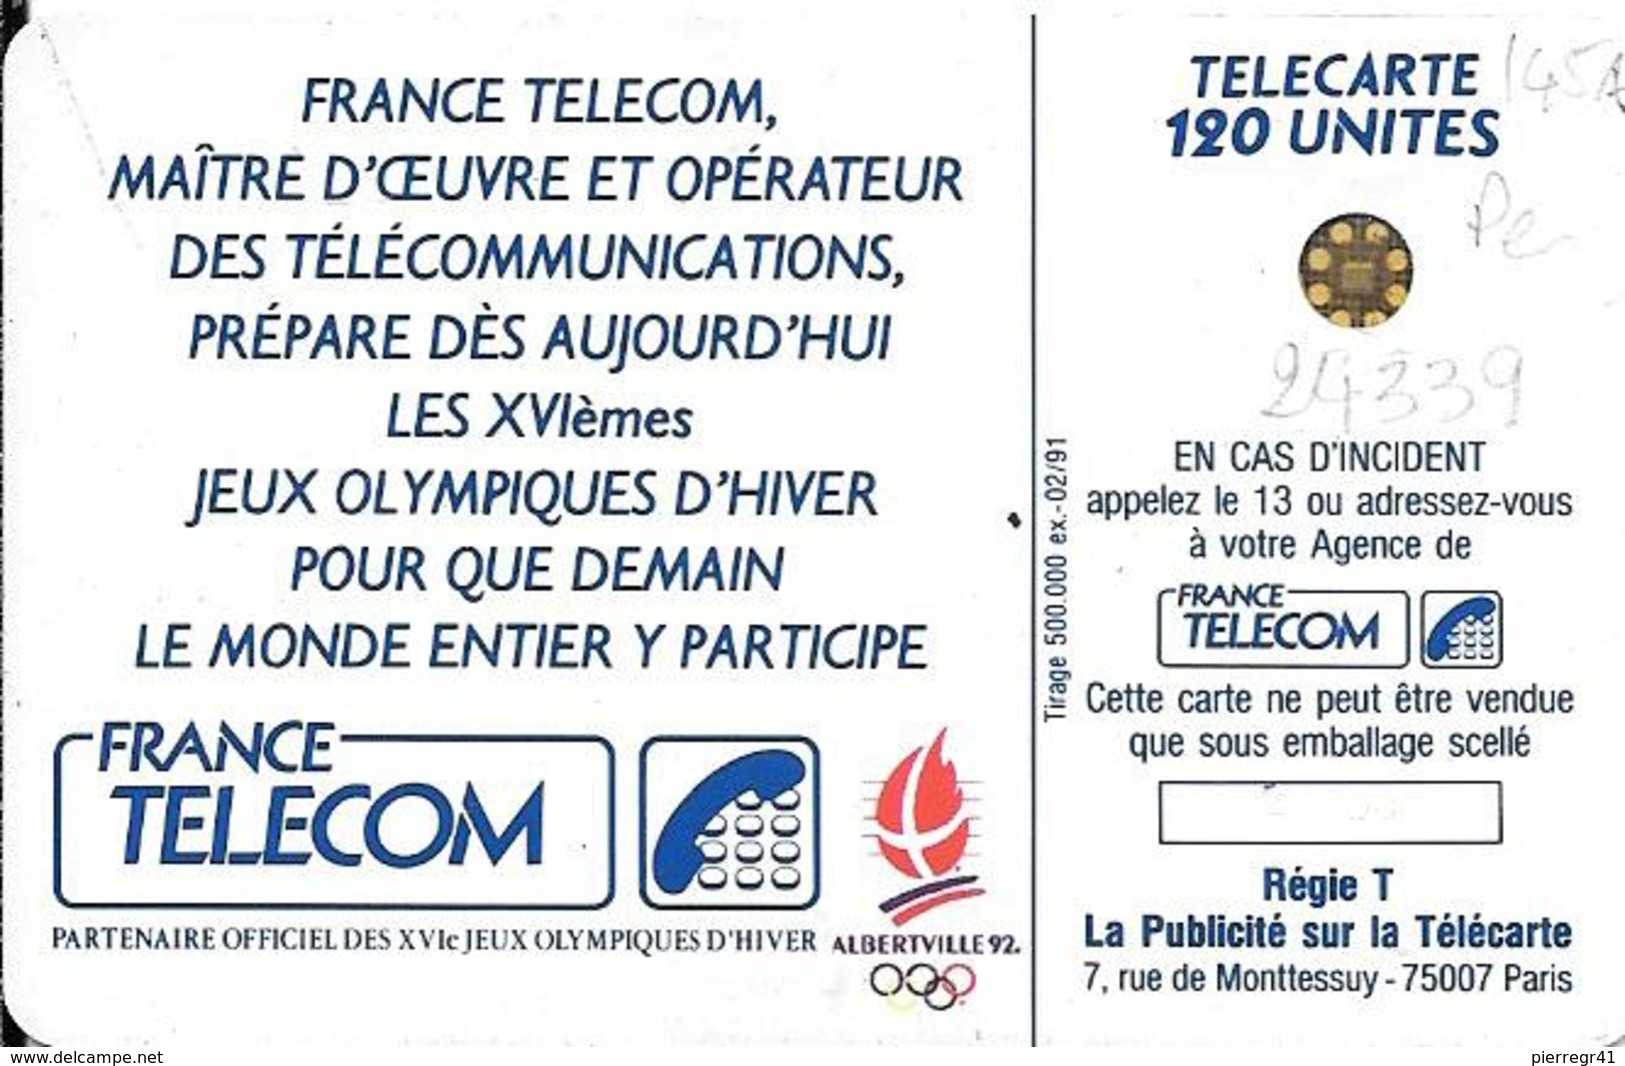 CARTE-PUCE-PUBLIC-F145A-120U-SC4 -Trou 6-02/91-5 Pe 24339-PATINEUSE 1-UTILISE-TBE - France